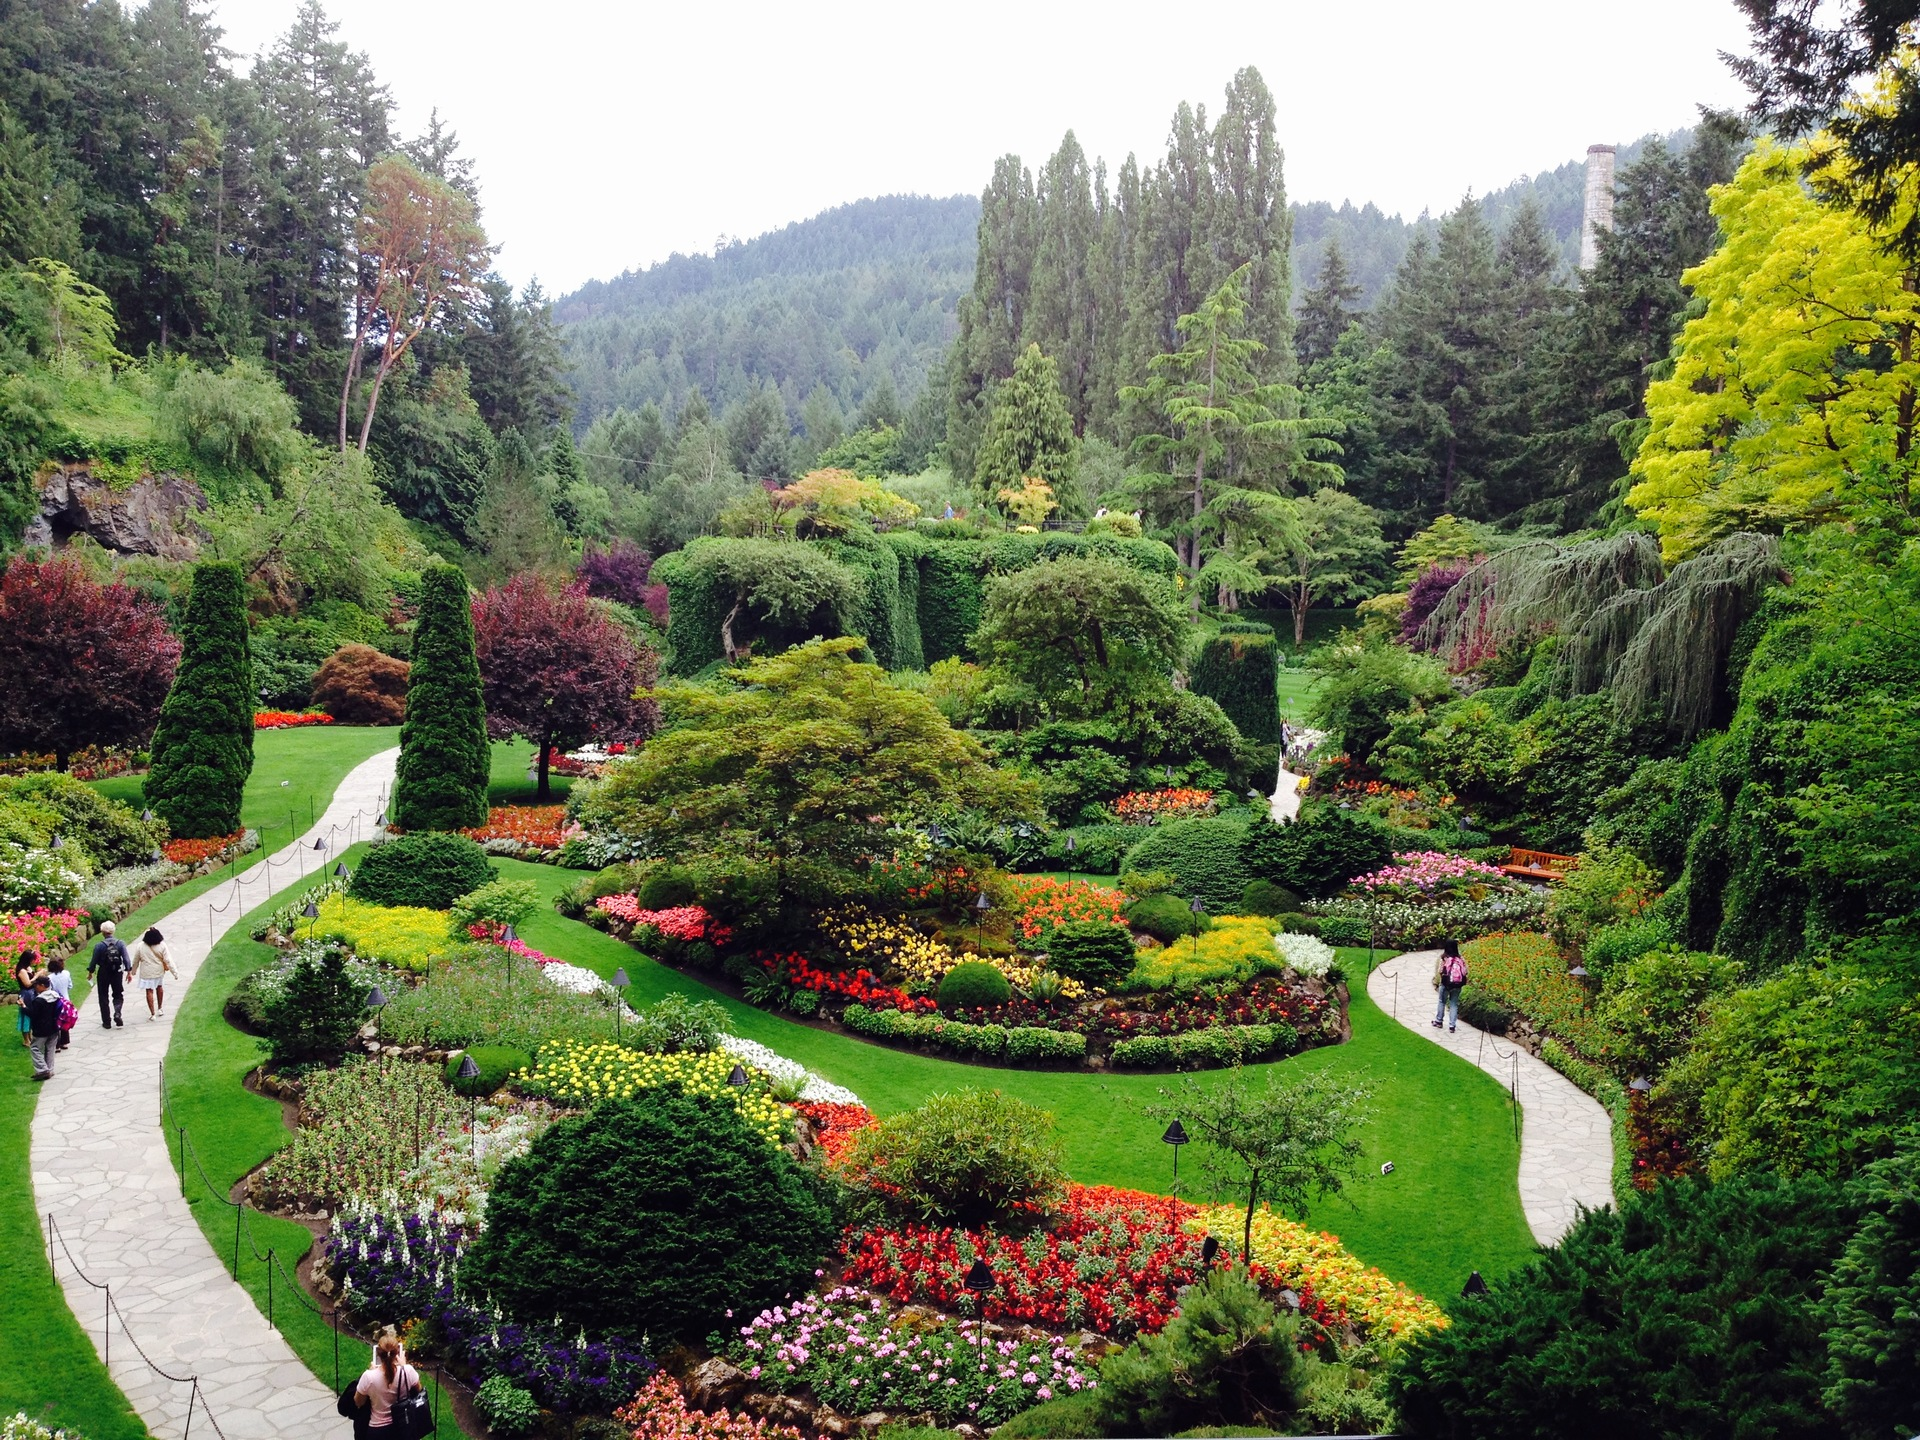 Grand Garden. Butchart Gardens in Brentwood Bay, Canada